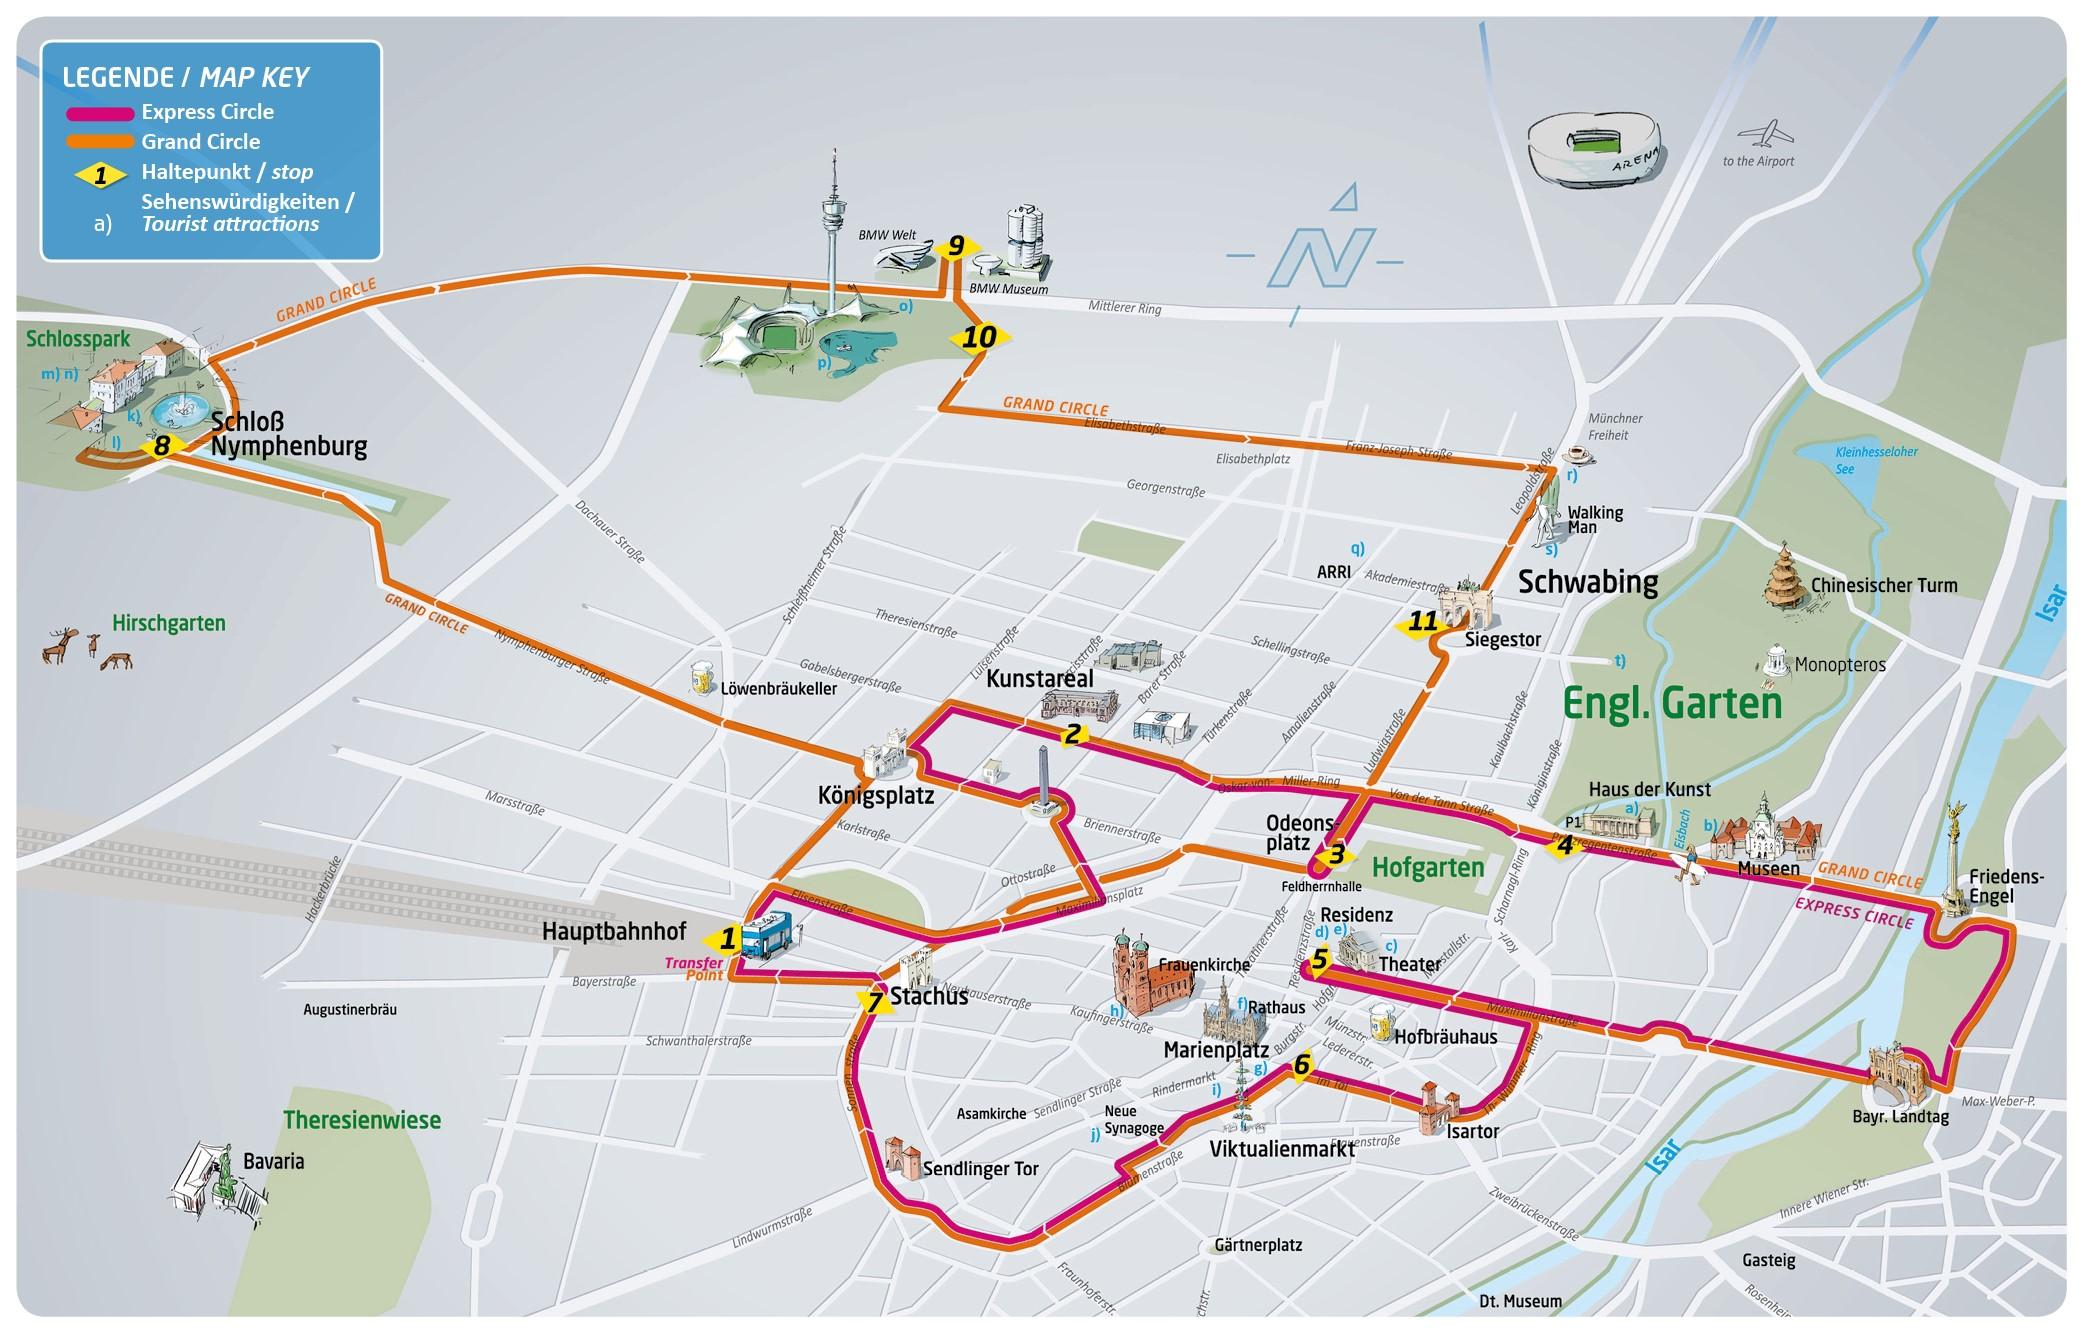 3 Best Munich Hop On Hop Off Bus Tours COMPARED Munich Open Bus